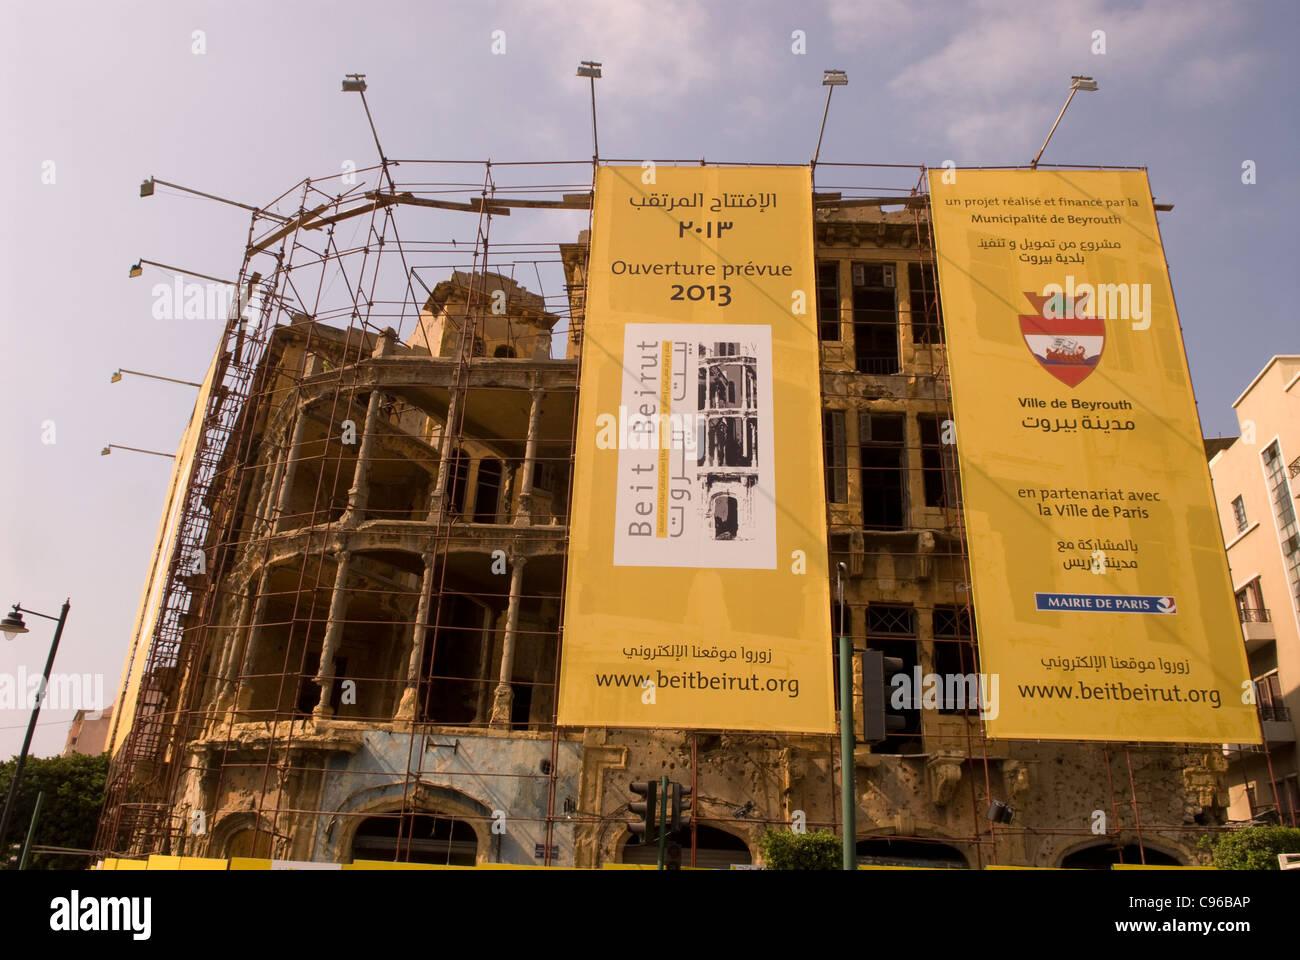 Barakat Gebäude, Beirut, Libanon. Dieser Krieg beschädigte Gebäude soll ein kulturelles Museum irgendwann Stockbild